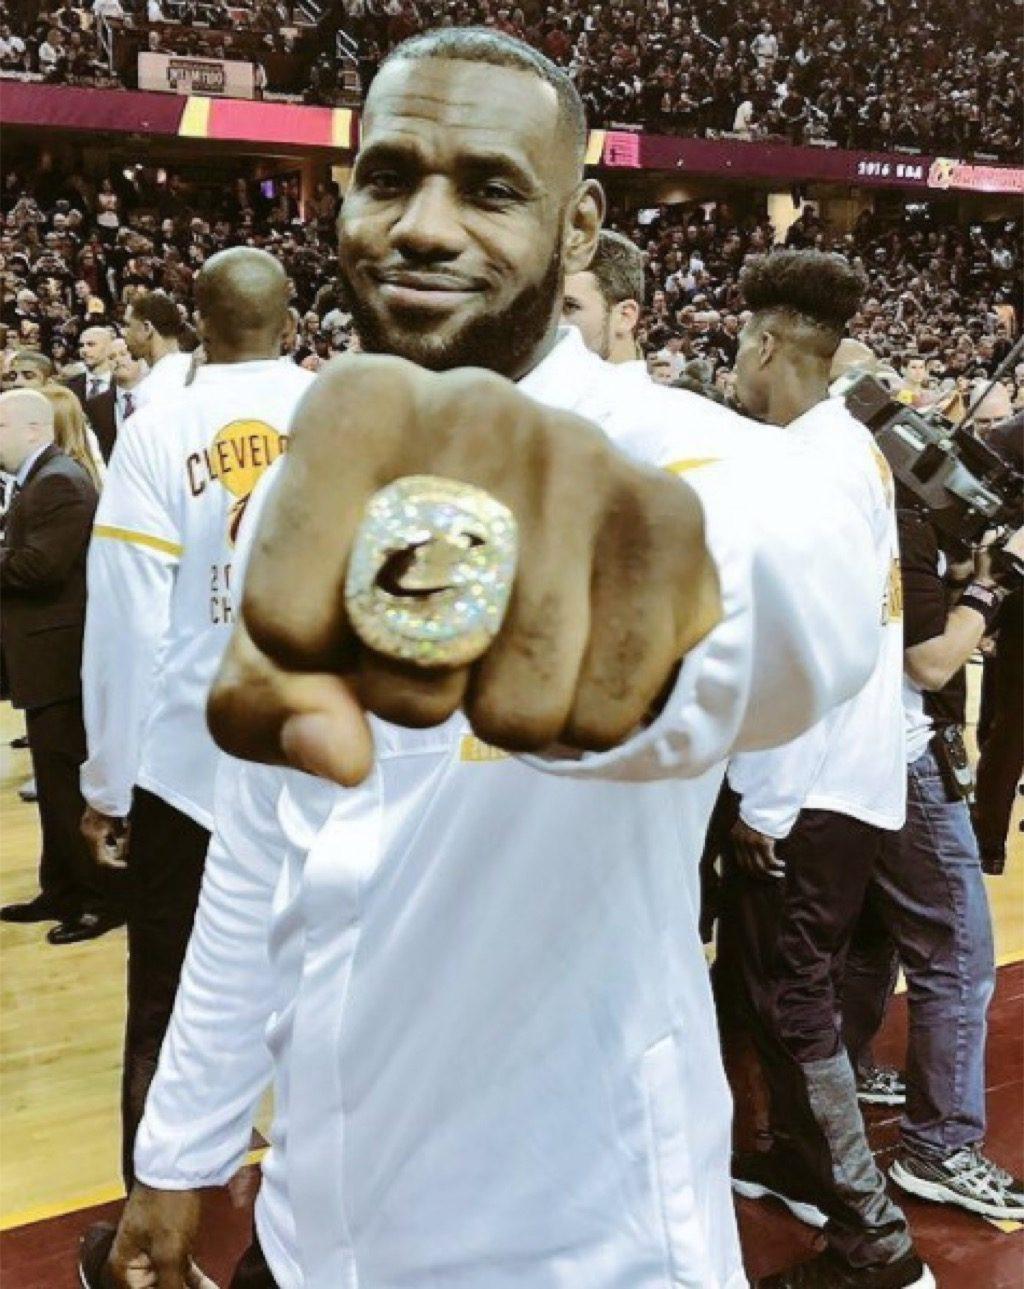 LeBron James, championship ring